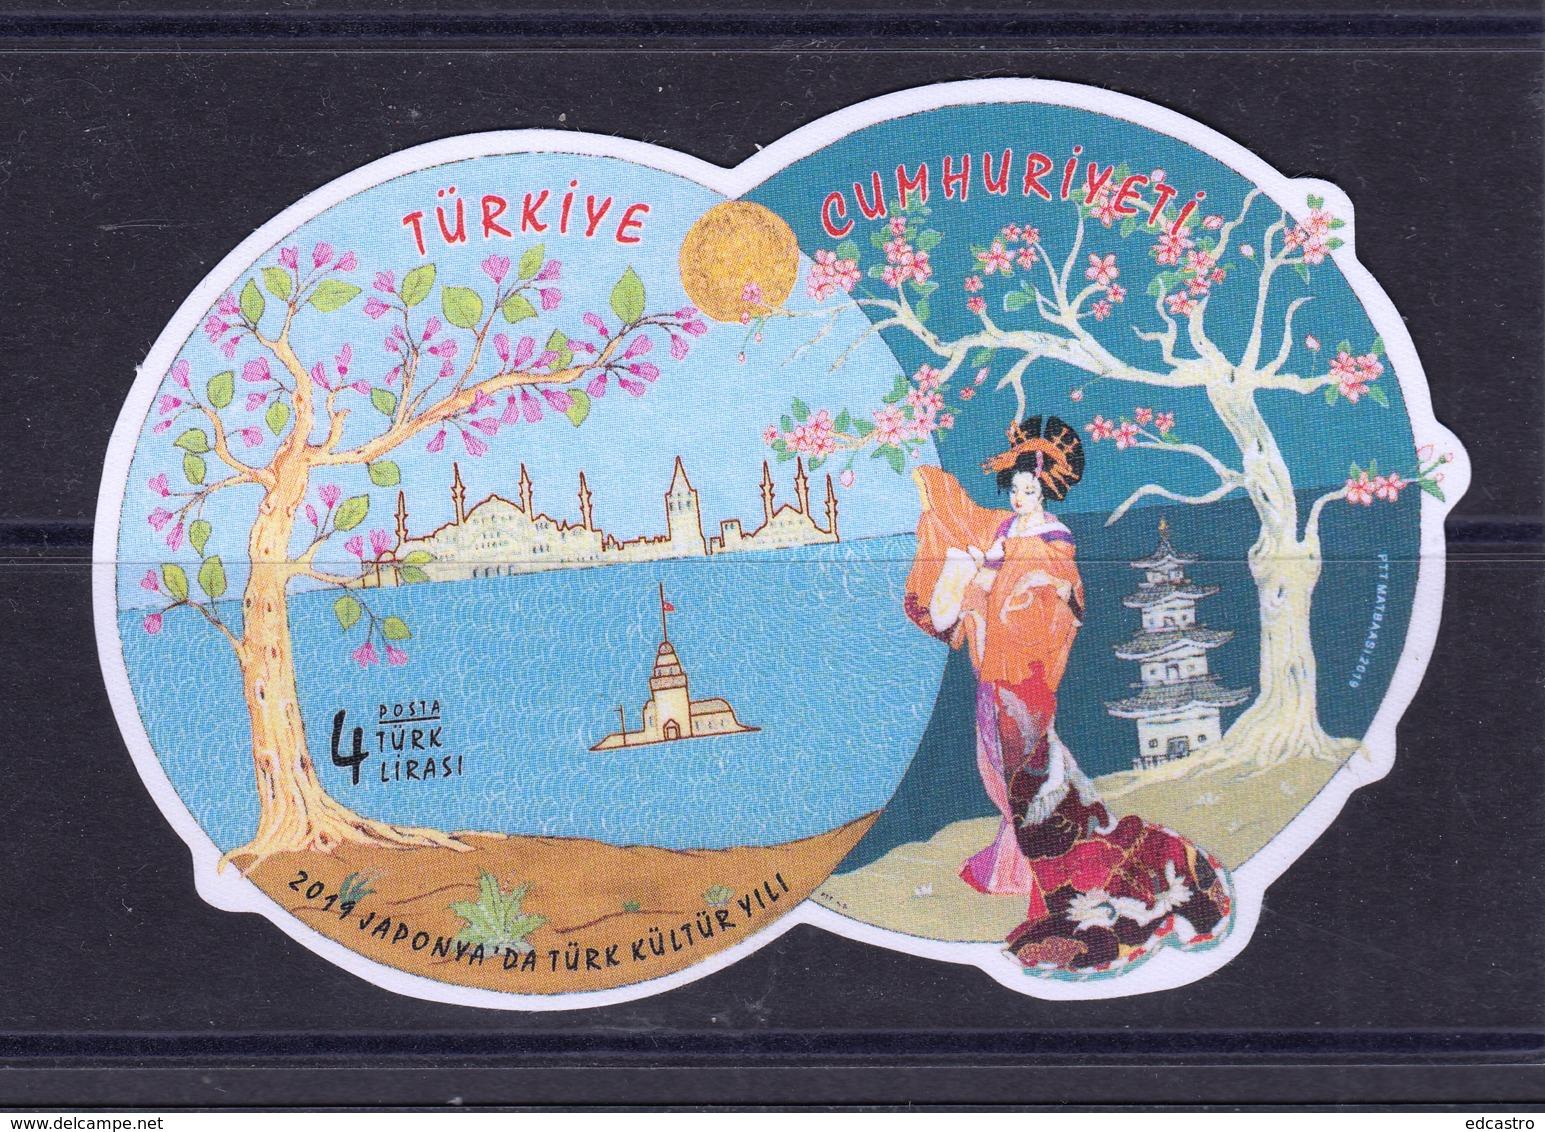 1.- TURKEY 2019 YEAR OF TURKİSH CULTURE İN JAPAN - Nuevos